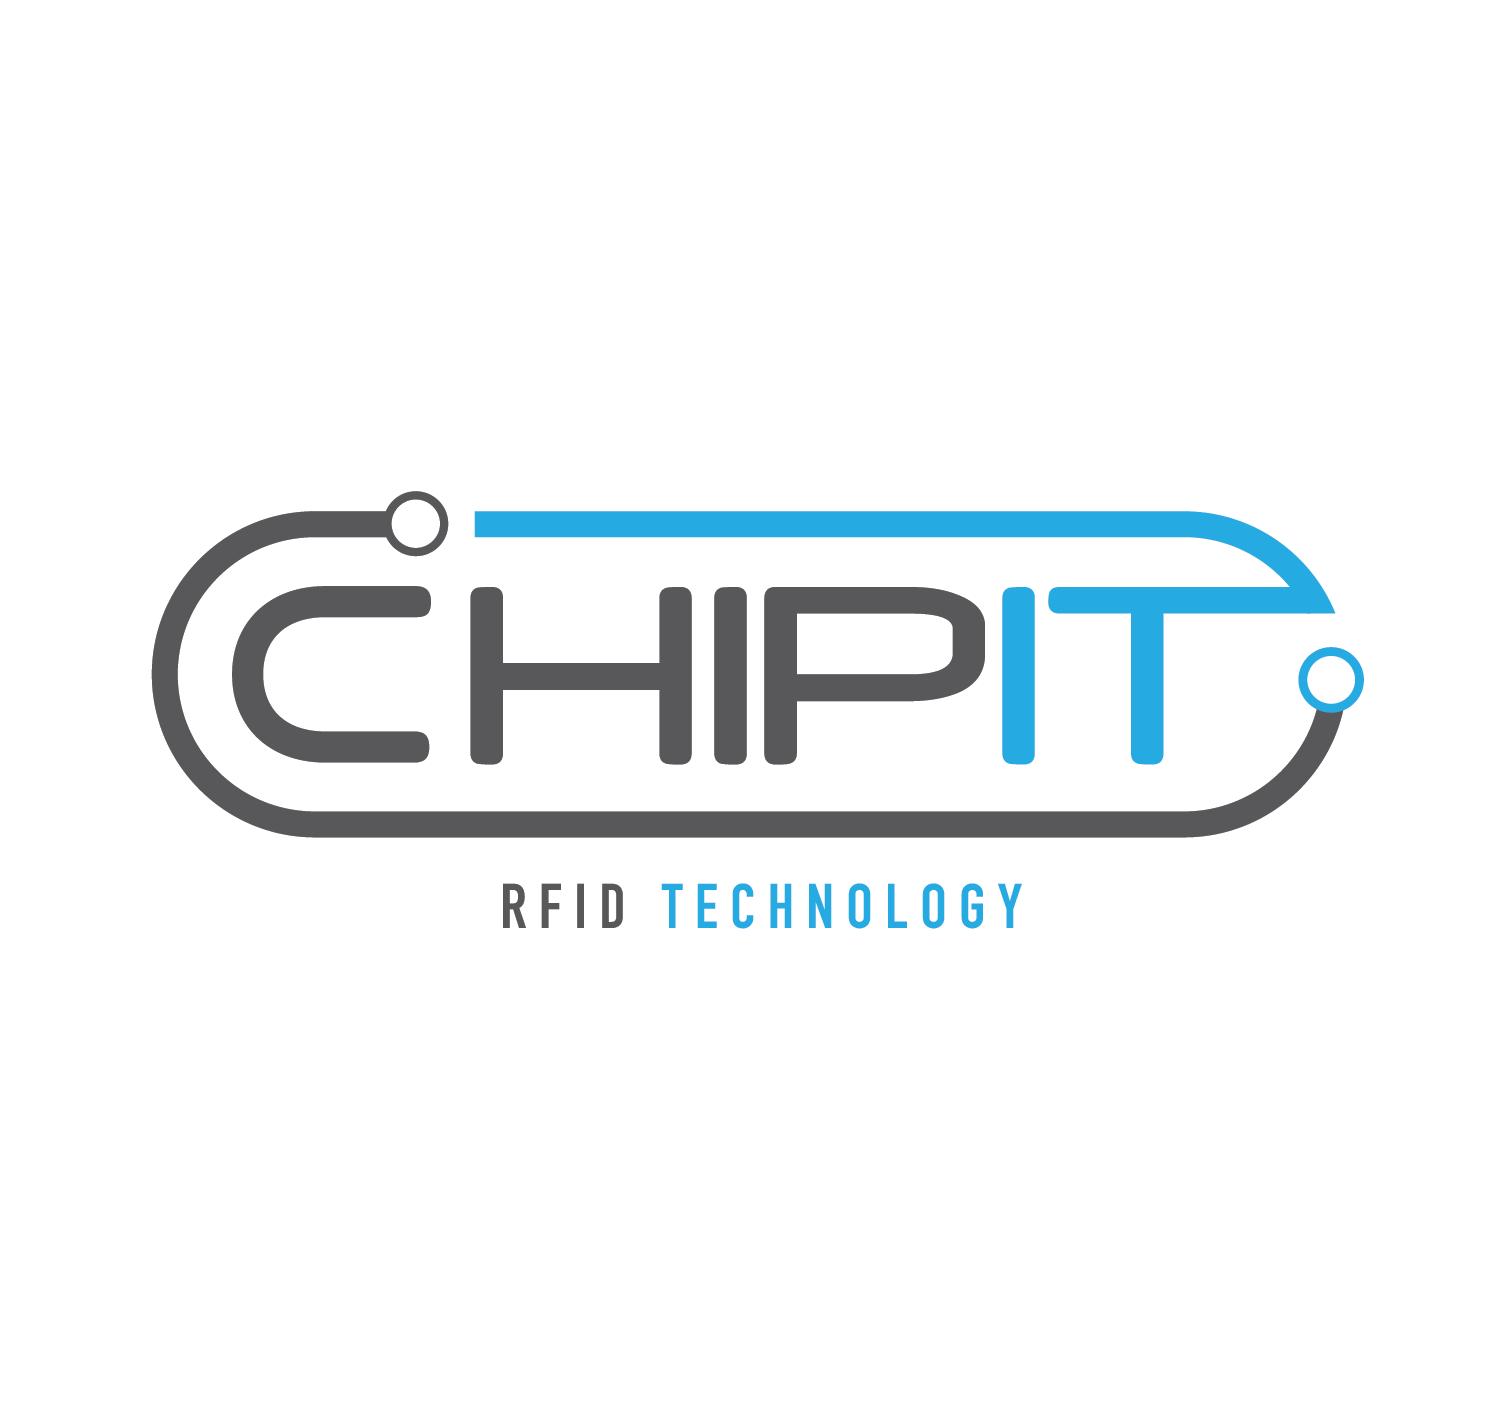 chipblue-onwhite